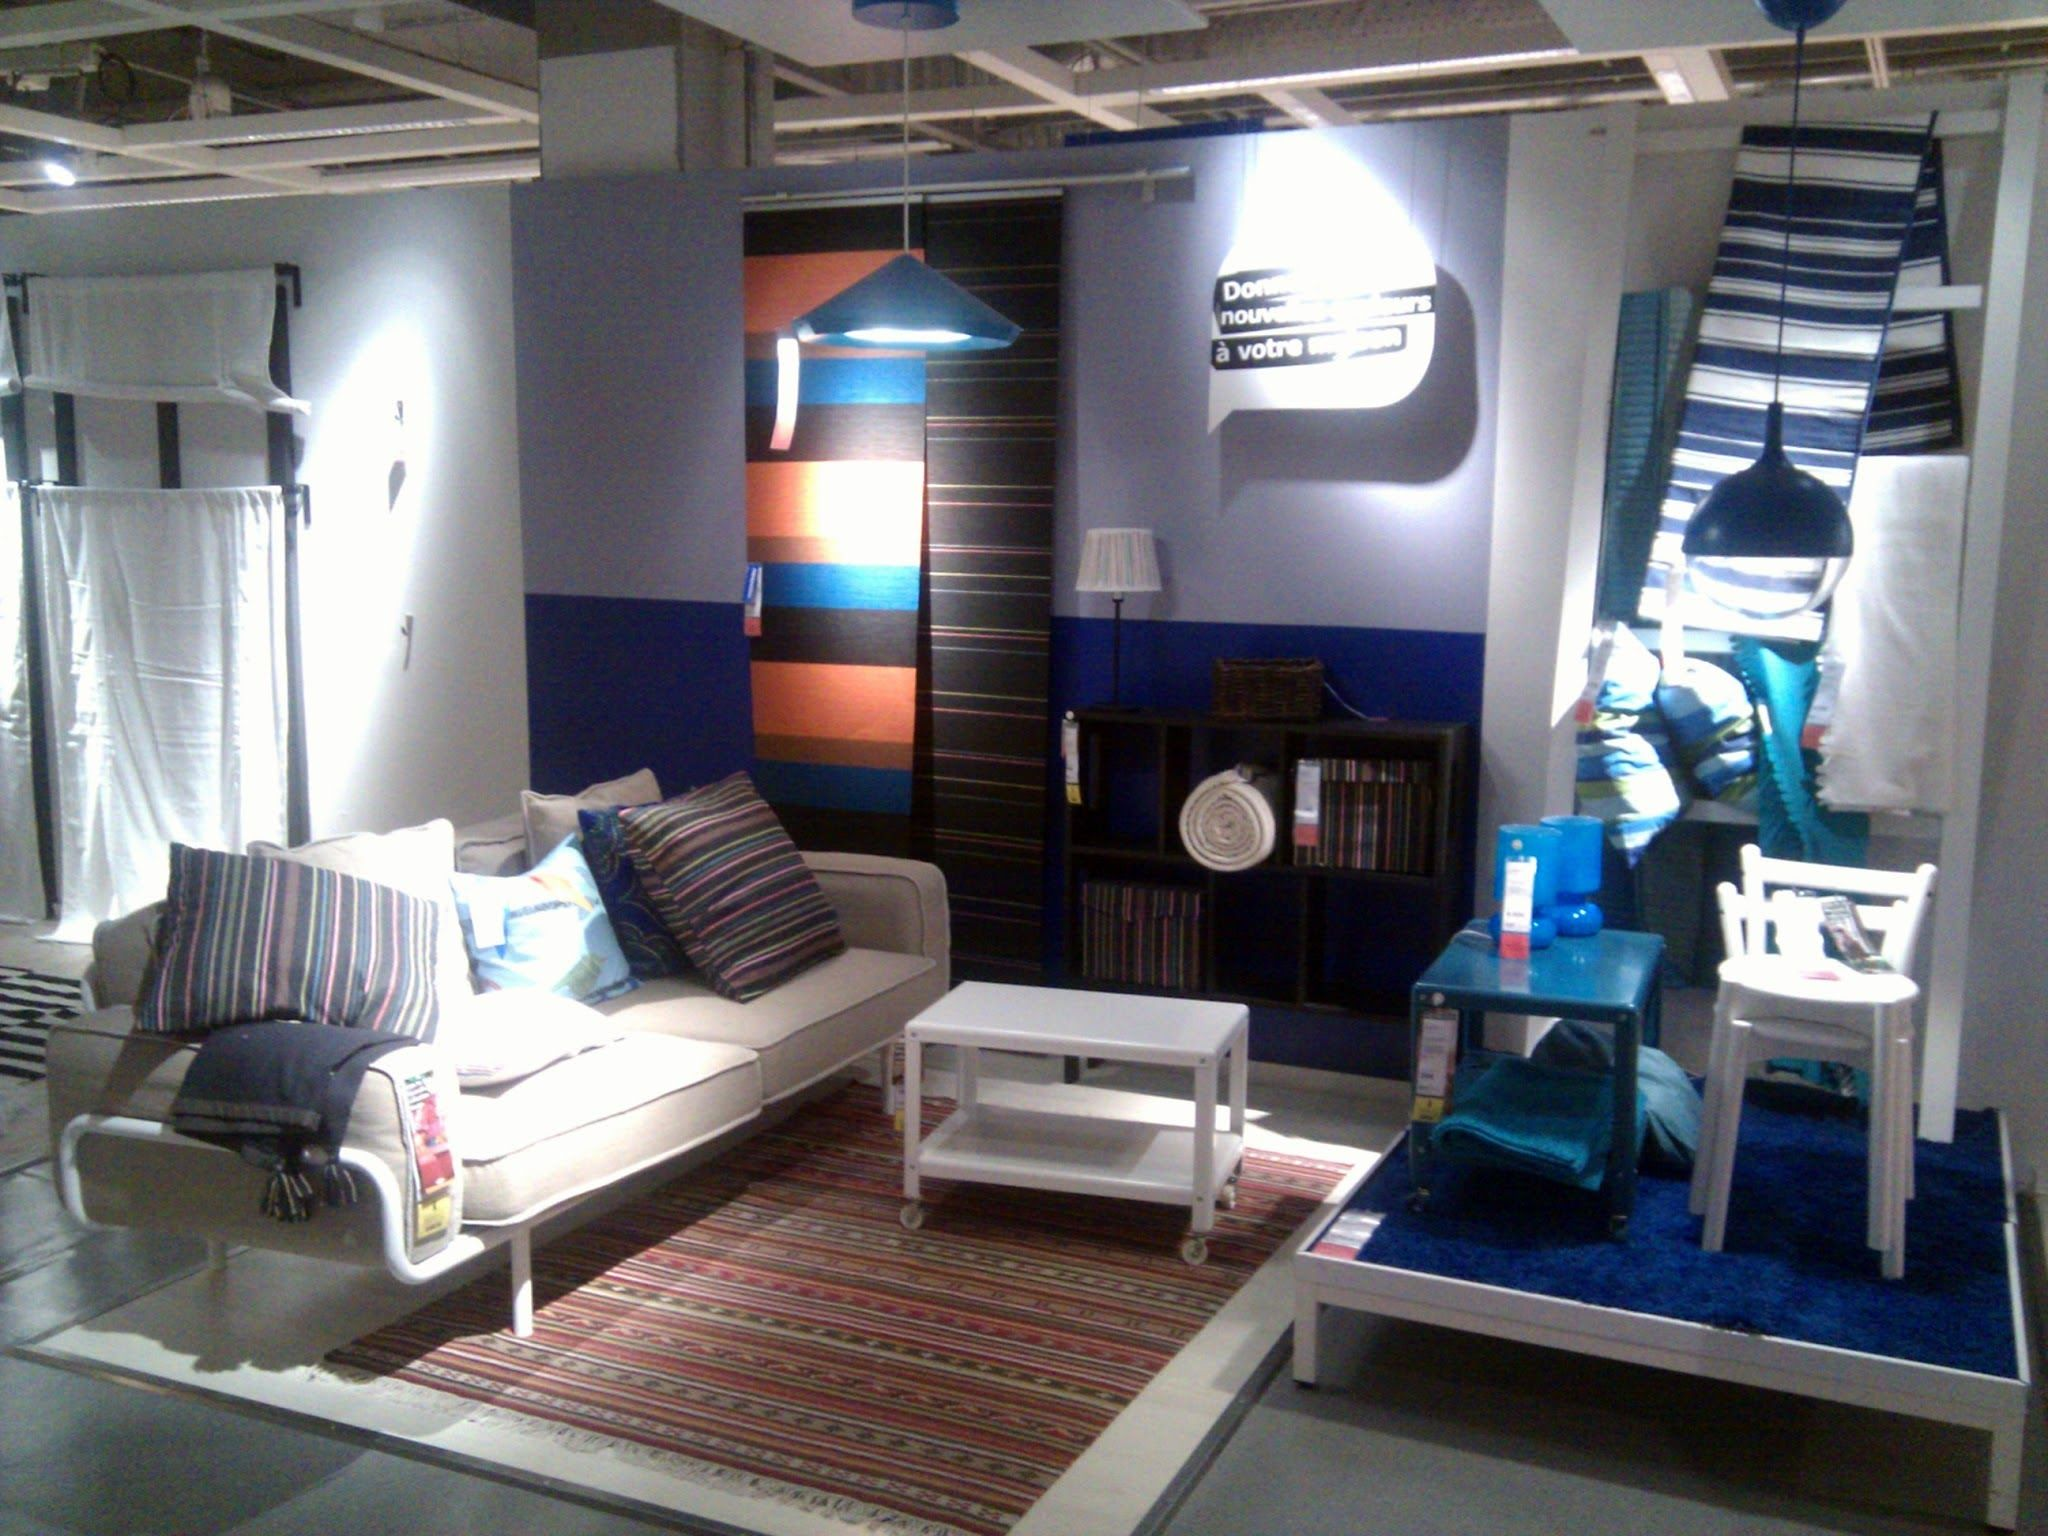 ikea rouen tourville la rivi re france ikea stores franconville france. Black Bedroom Furniture Sets. Home Design Ideas